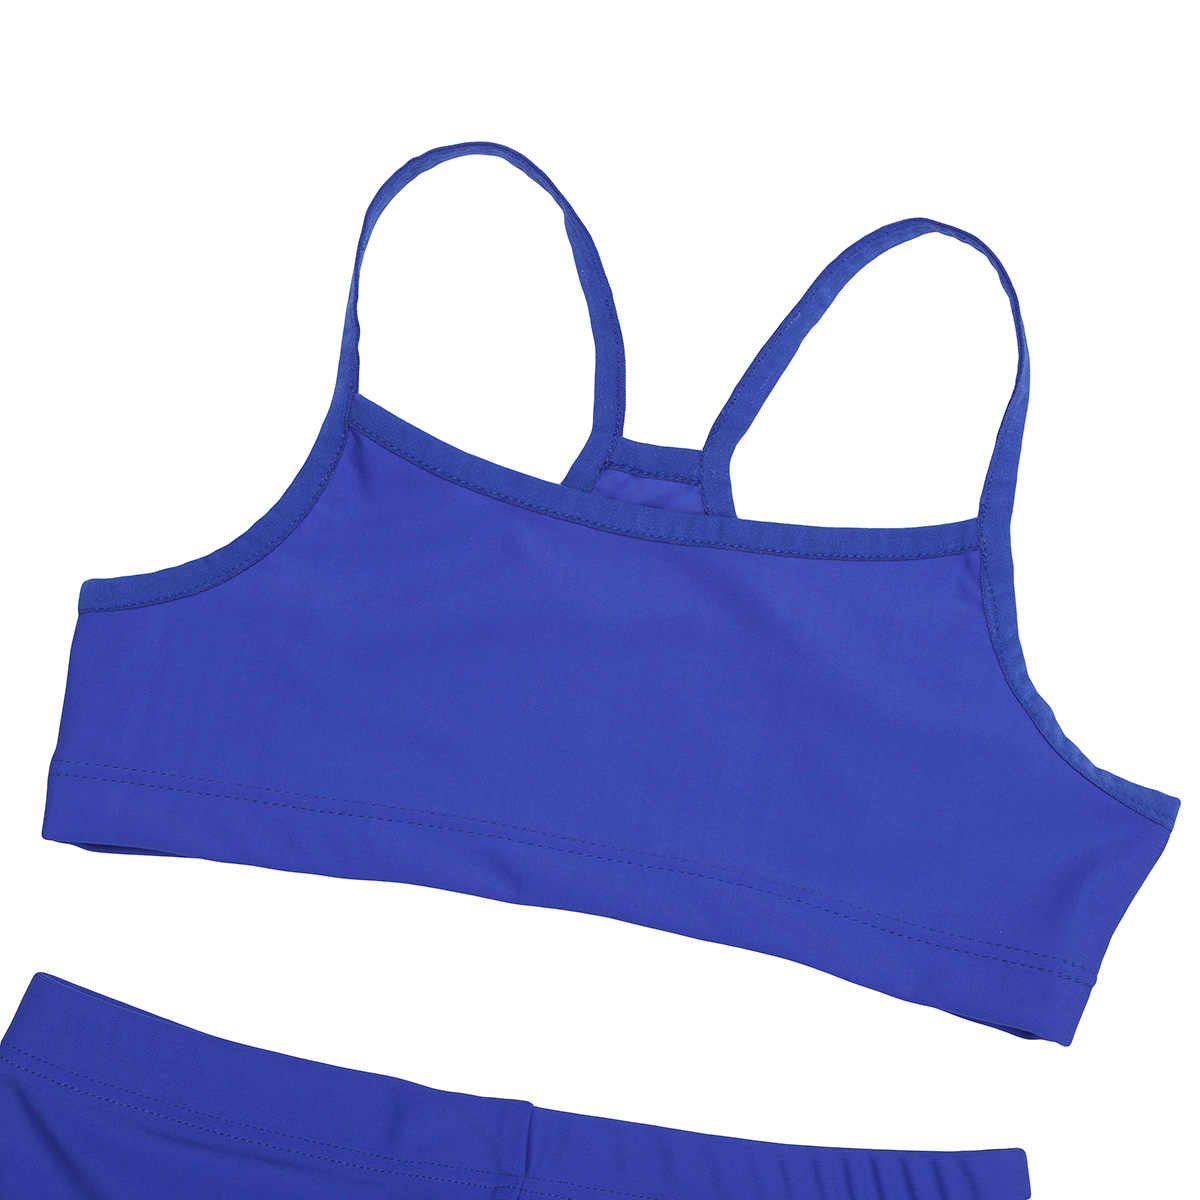 2 PCS Anak Perempuan Tankini Tank Top dengan Celana Senam Celana Pendek Tari Gym Tanpa Lengan Celana Dalam Celana Dalam Pakaian Renang Pantai Musim Panas